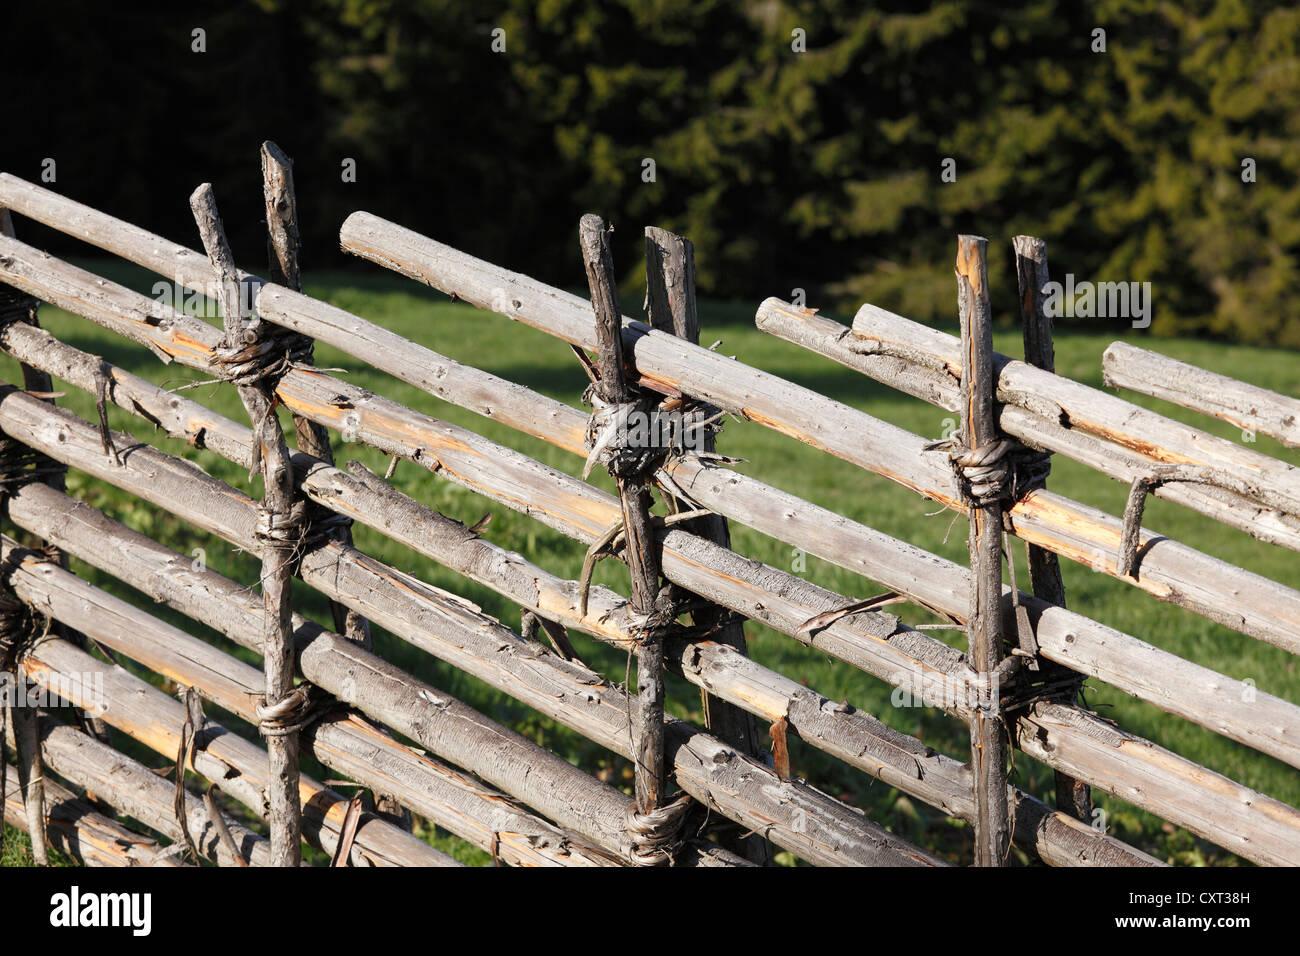 Traditional fence, Kluppeneggerhof farm in Alpl, Krieglach, Waldheimat region, Styria, Austria, Europe - Stock Image